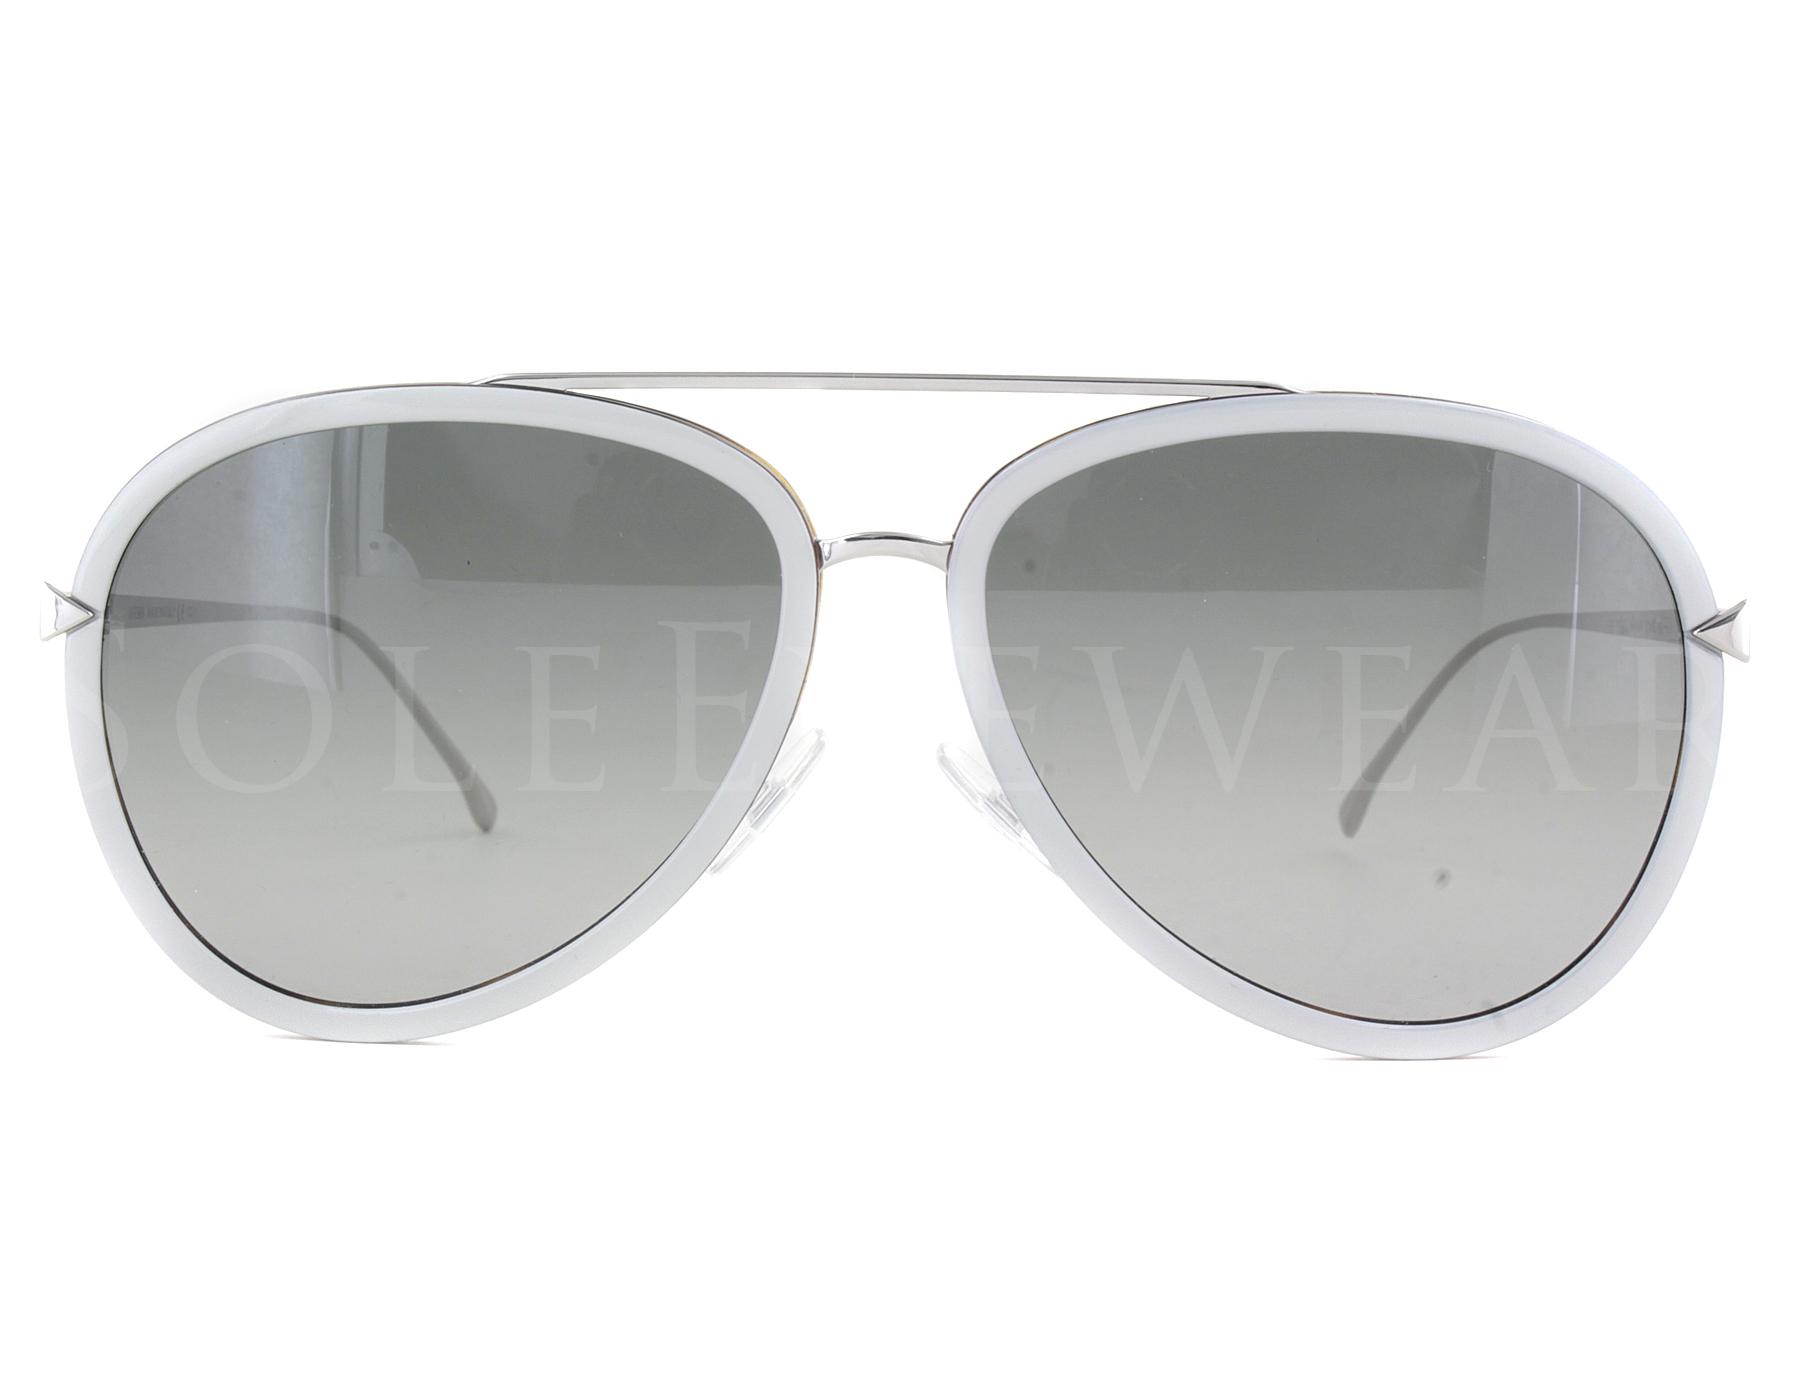 55ccf54c23 Details about uNEW Fendi 0155 S V5AVK Beige Palladium   Grey Gradient  Sunglasses